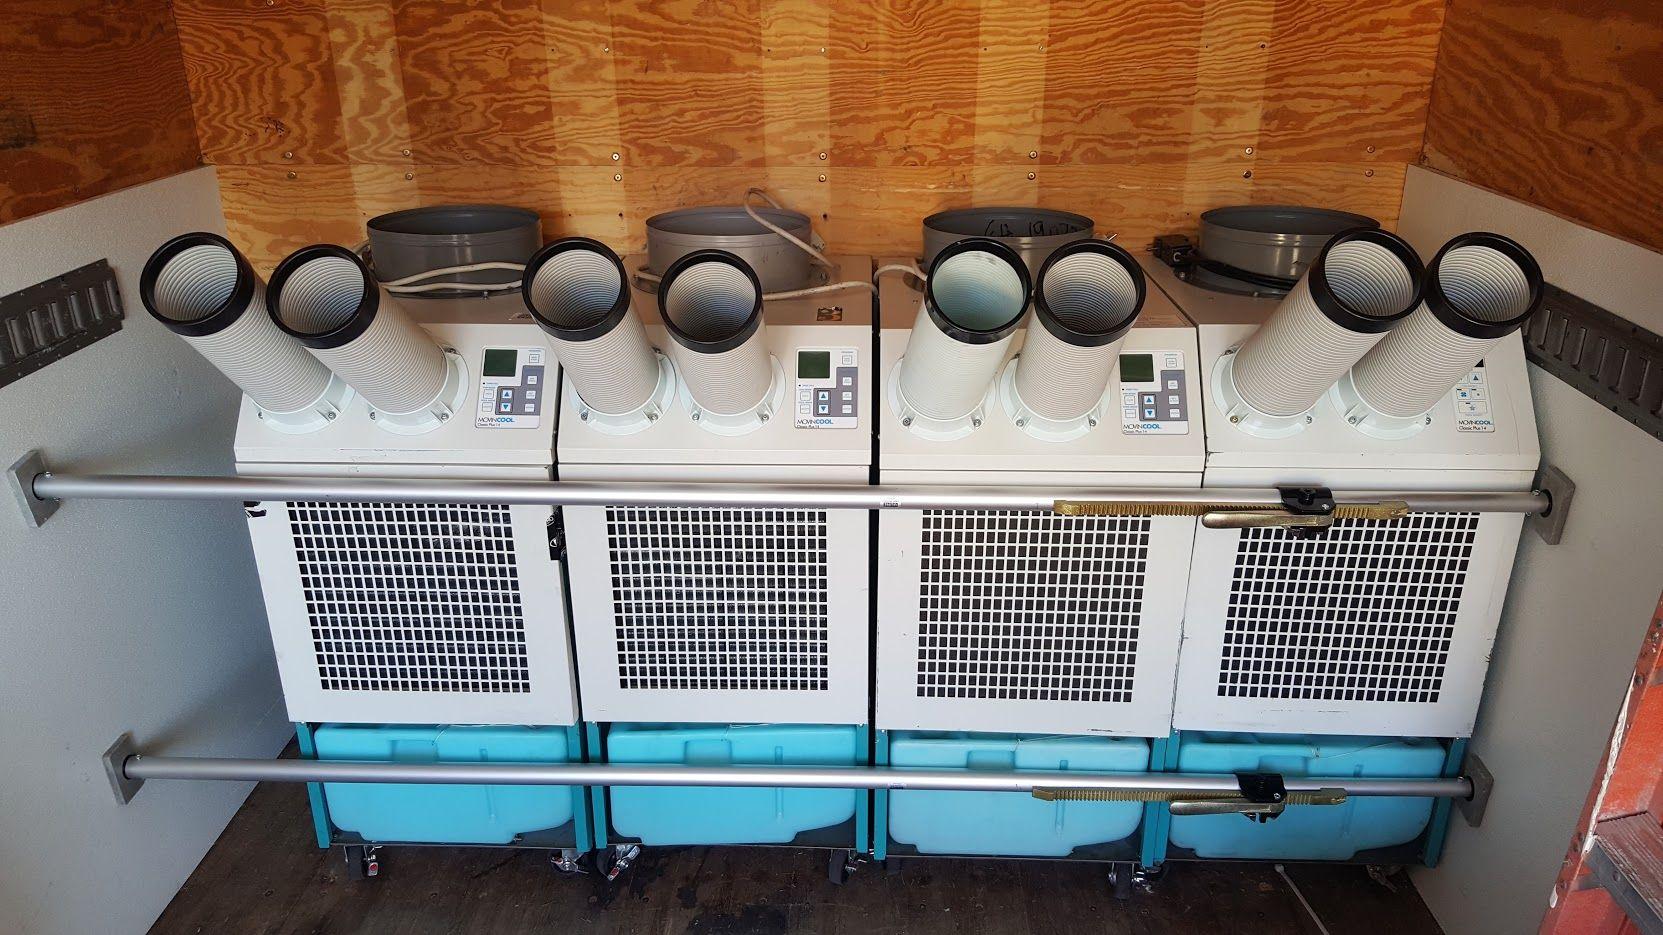 Portable AC Rentals Portable ac, Rental, Kitchen appliances